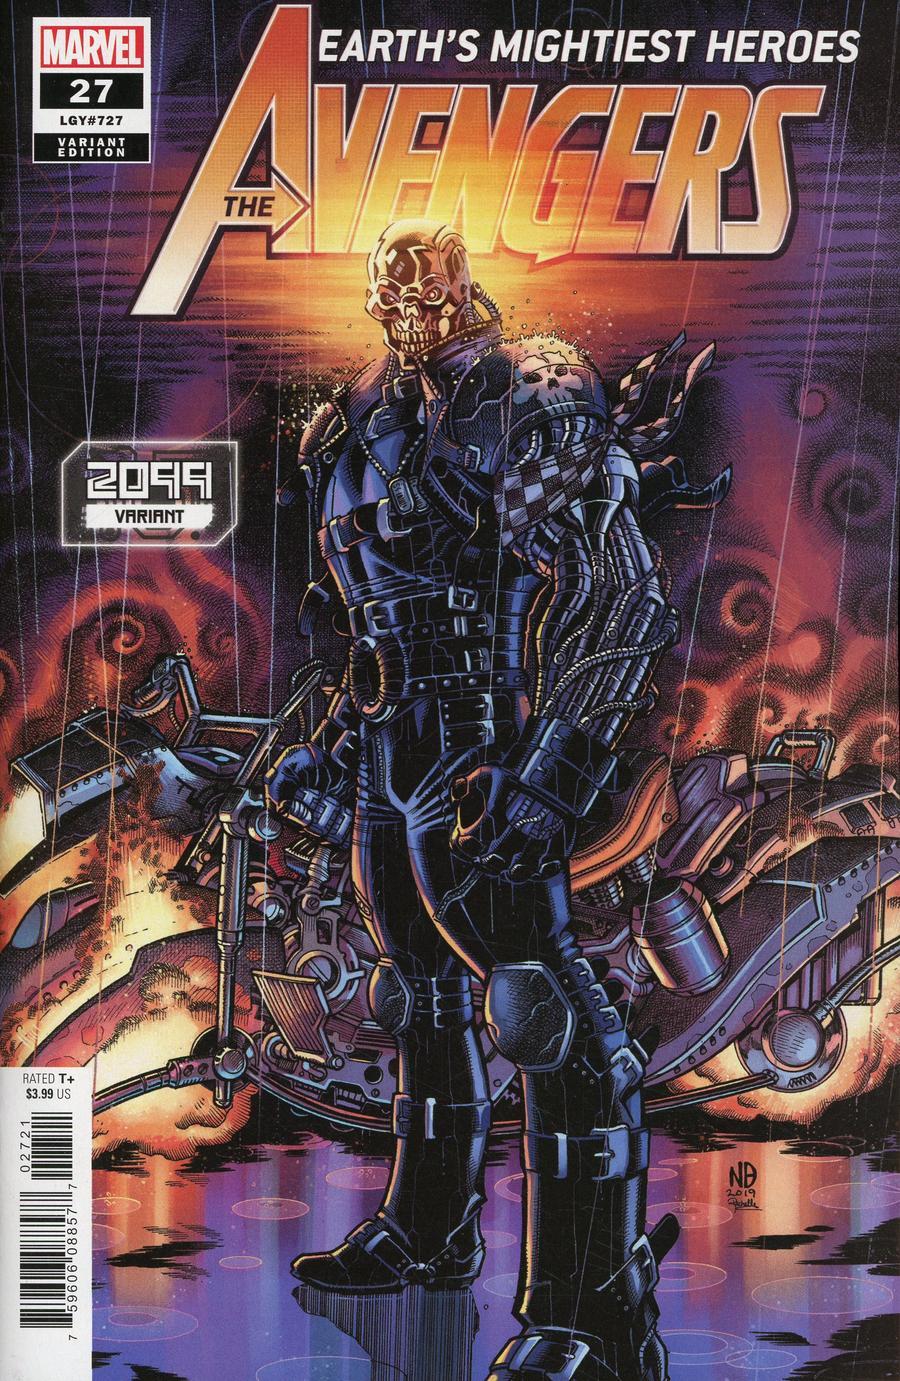 Avengers Vol 7 #27 Cover B Variant Nick Bradshaw 2099 Cover